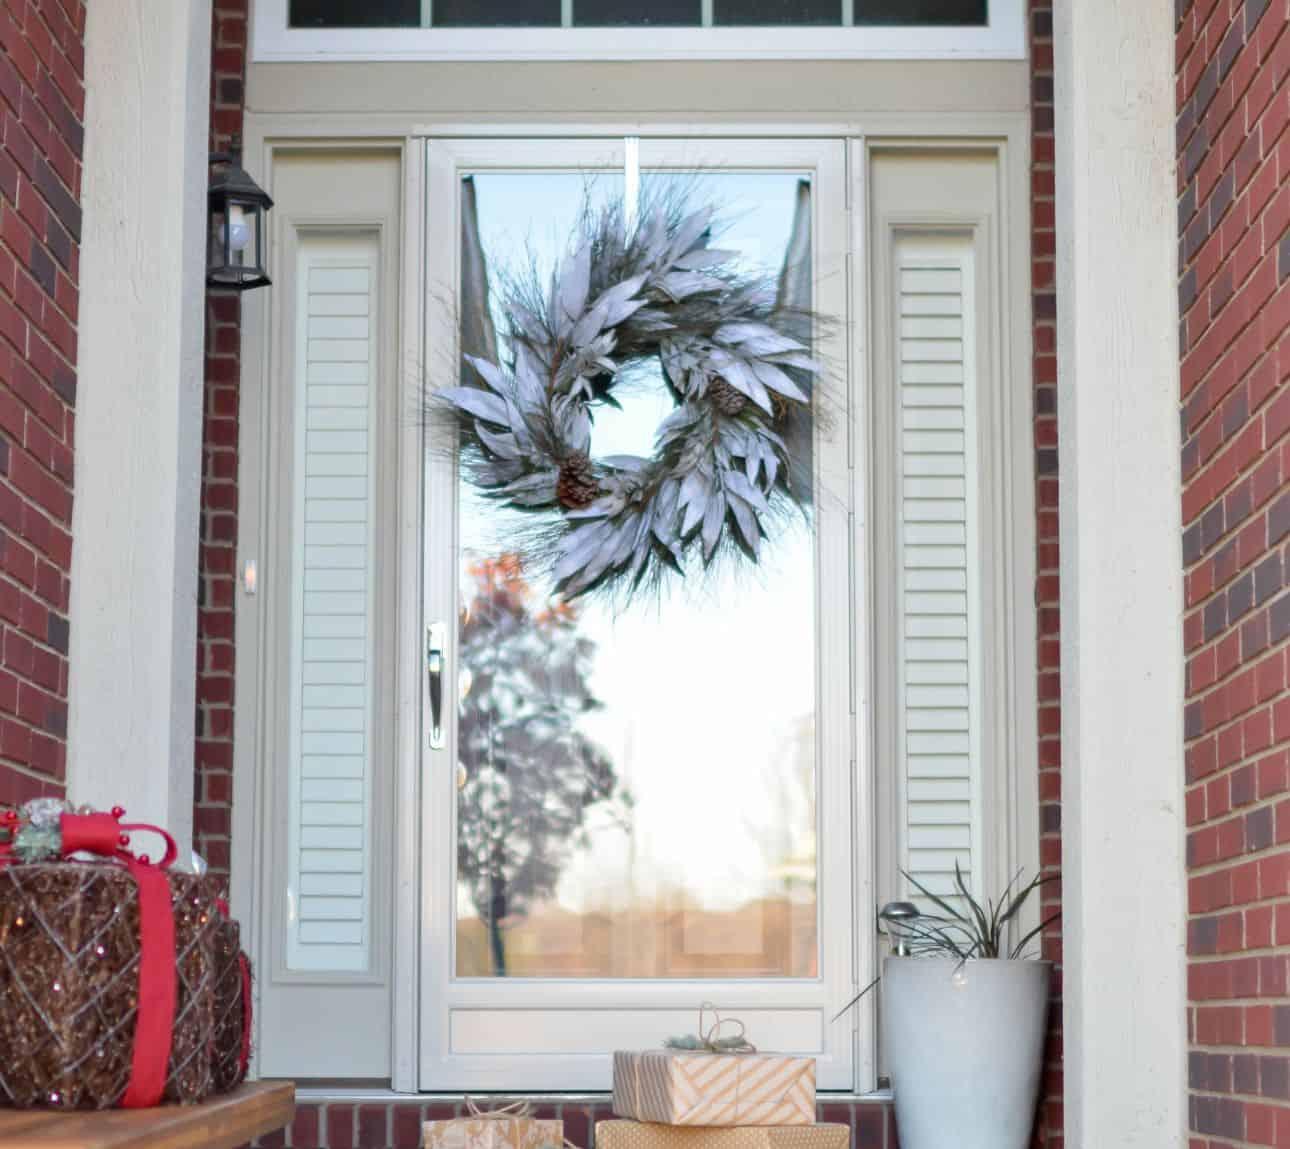 kerb-appeal-house-front-6-upgrade-the-door